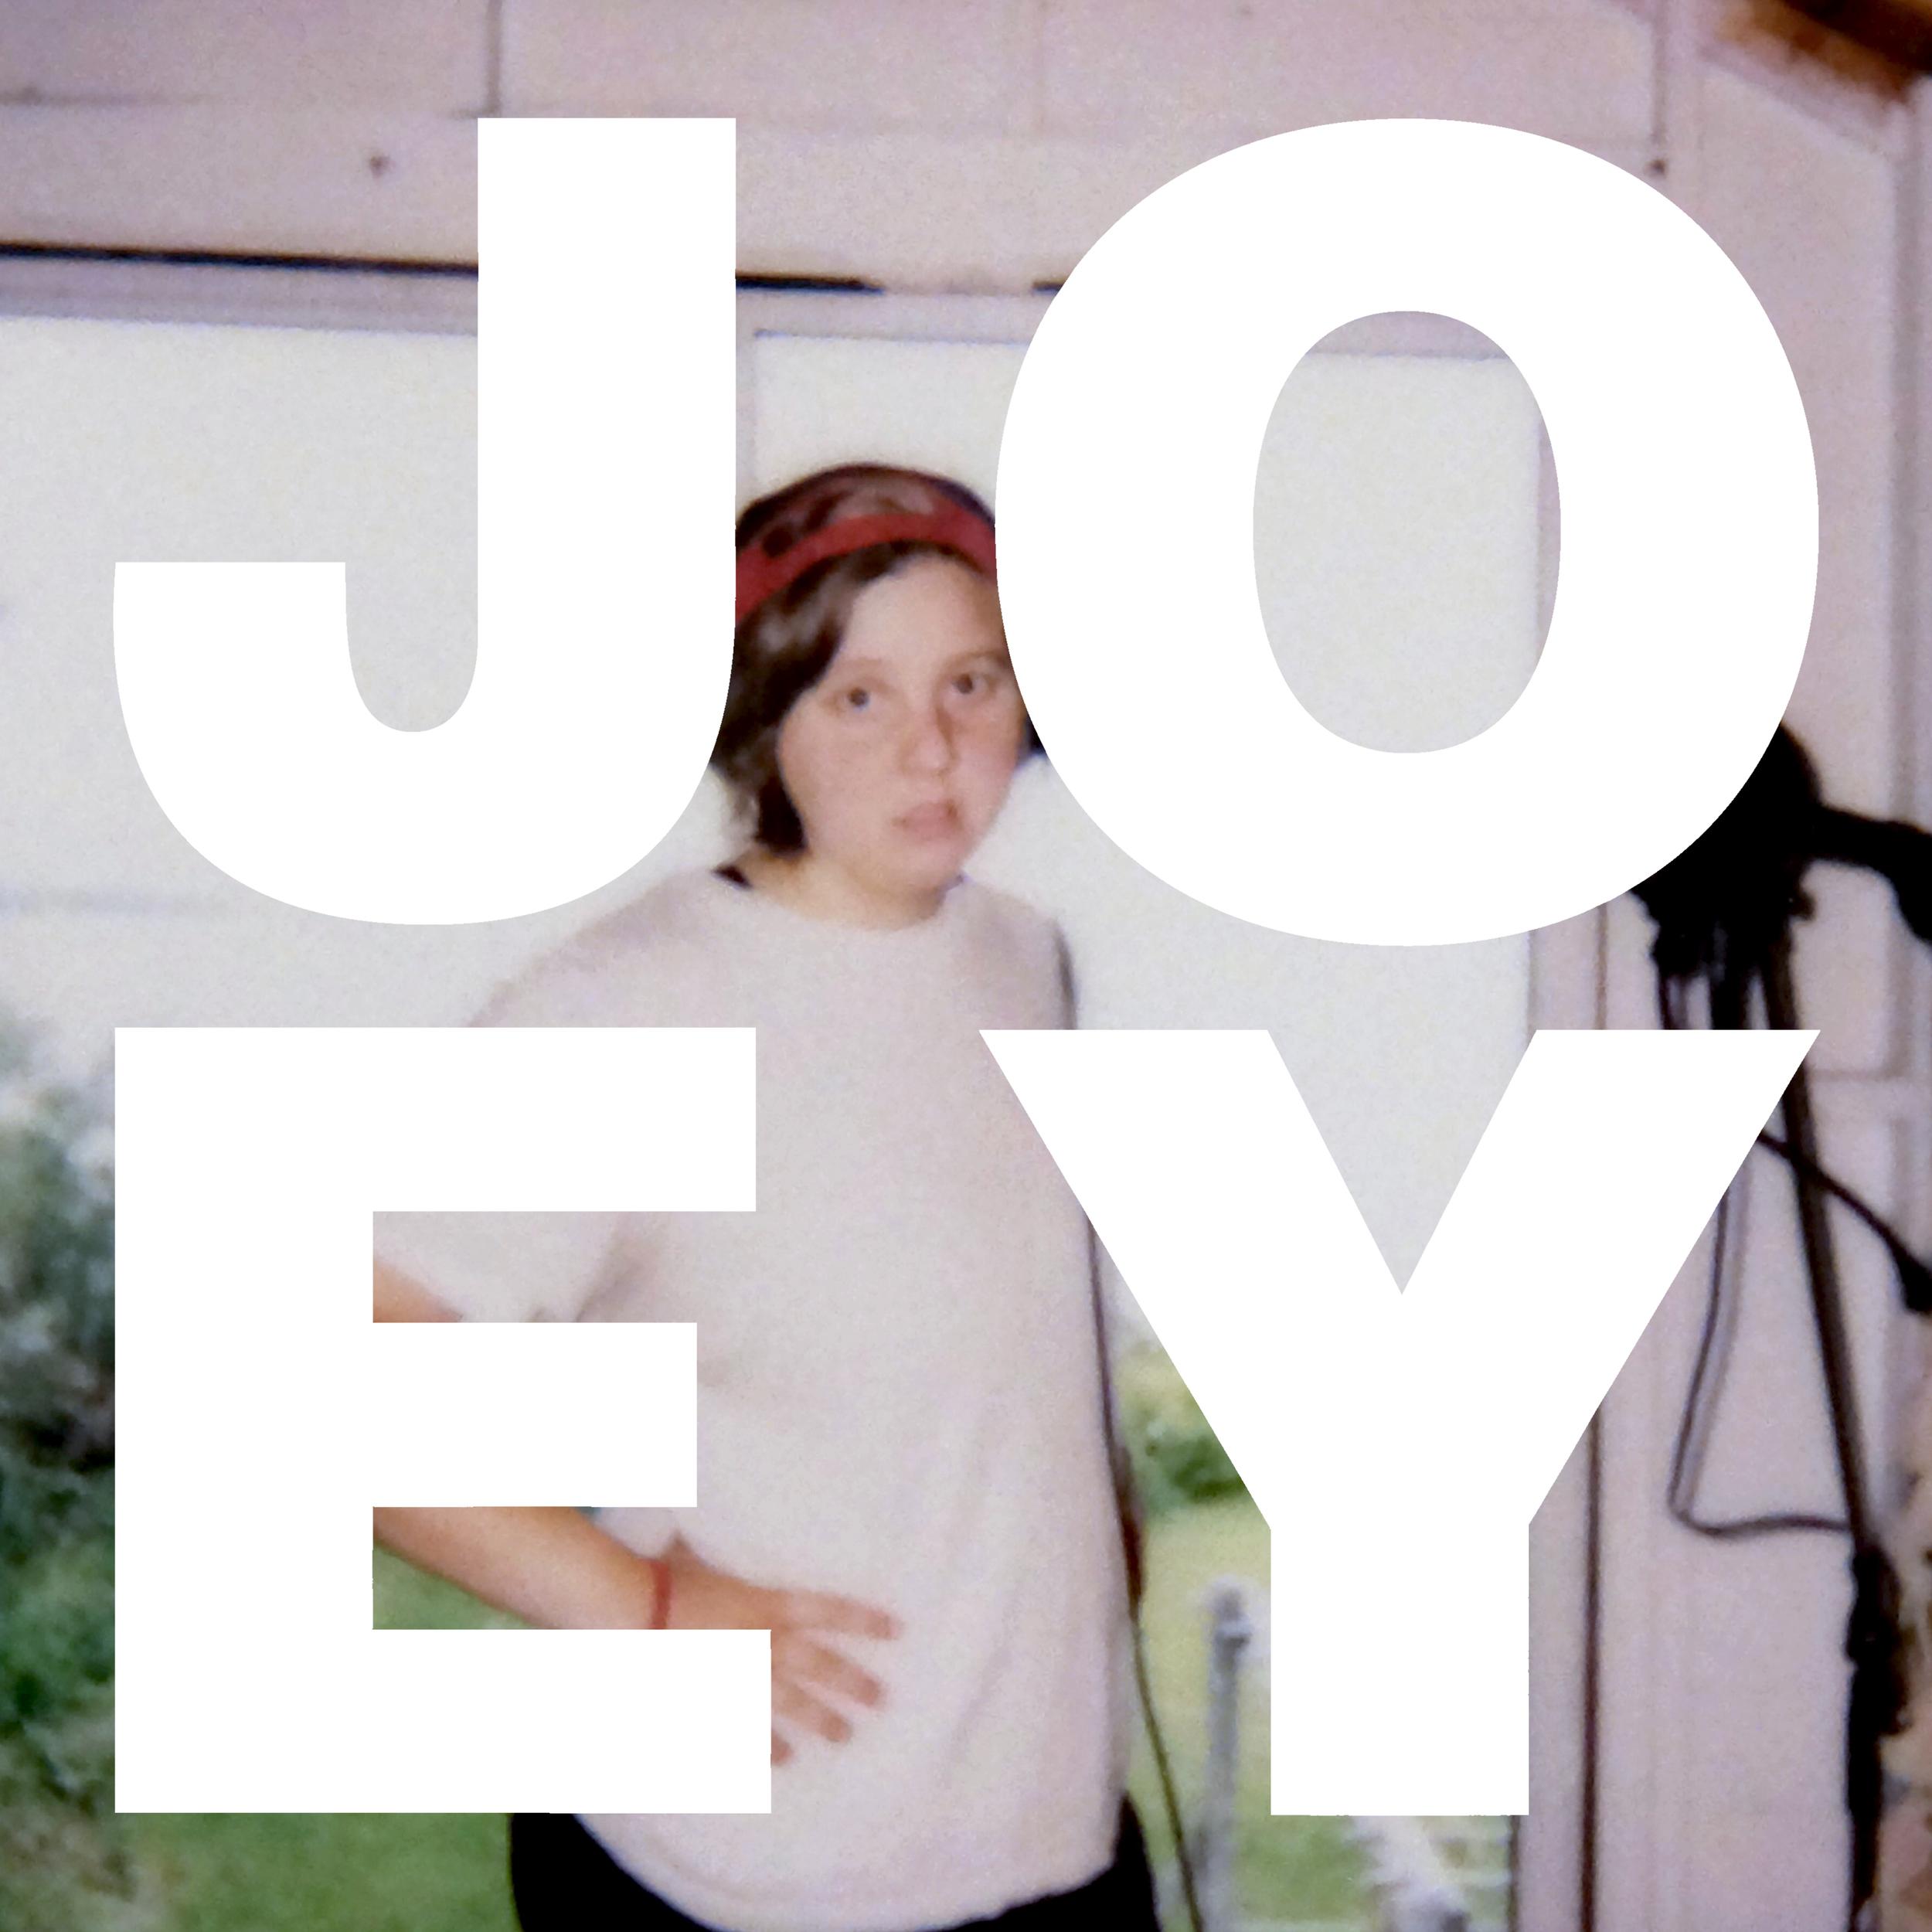 JoeyFinalFront.jpg